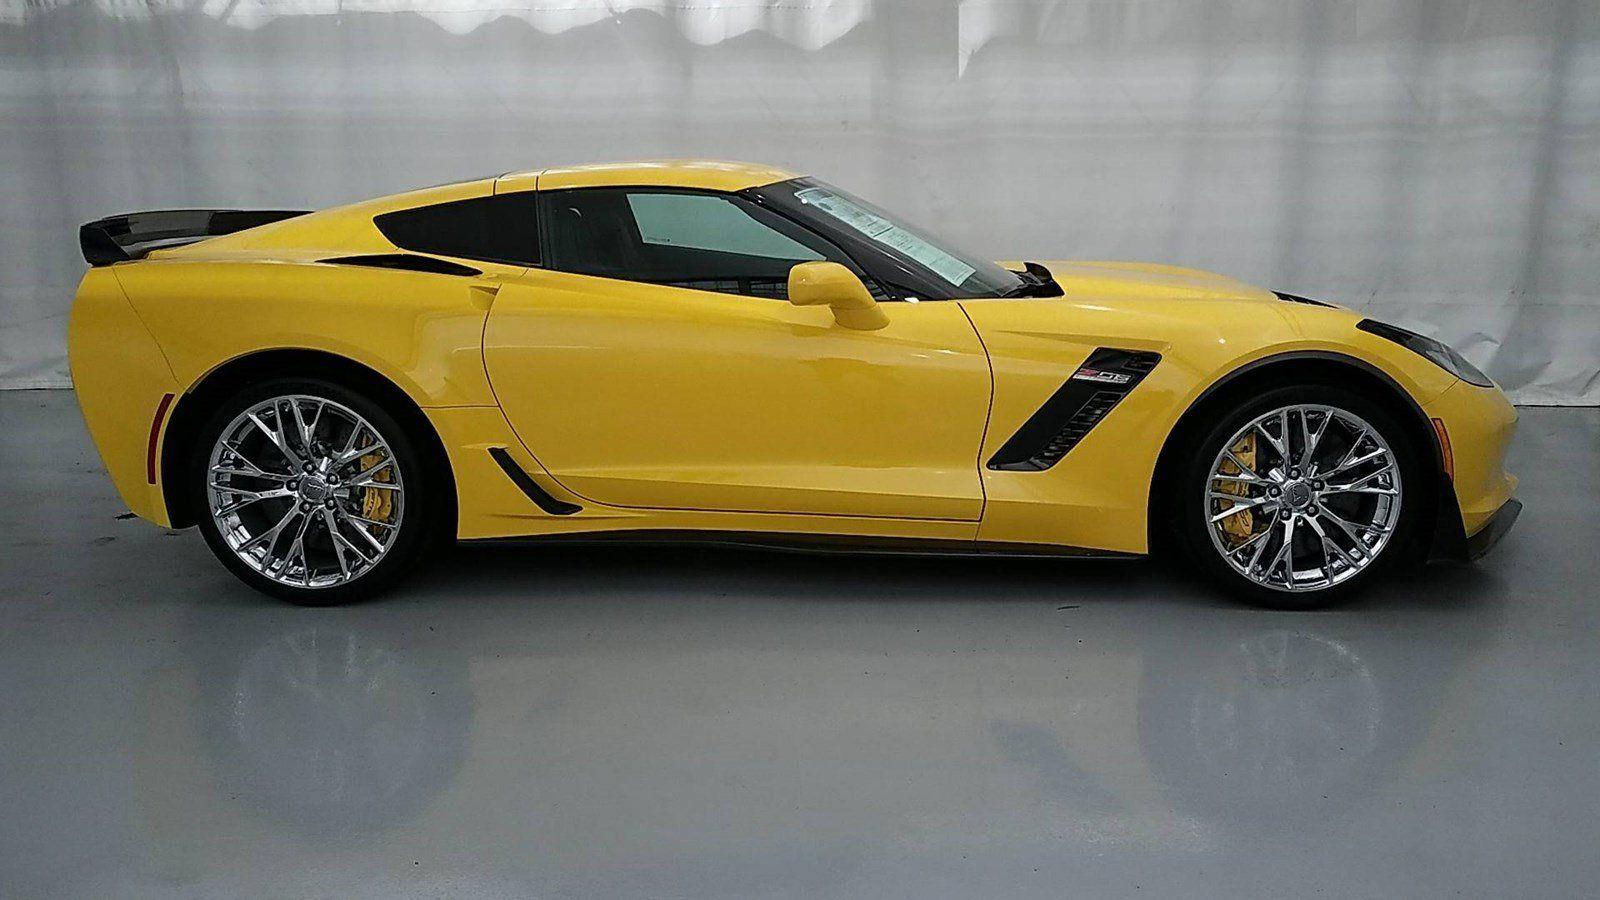 Cars For Used 2017 Chevrolet Corvette Z06 Coupe In Hammond La